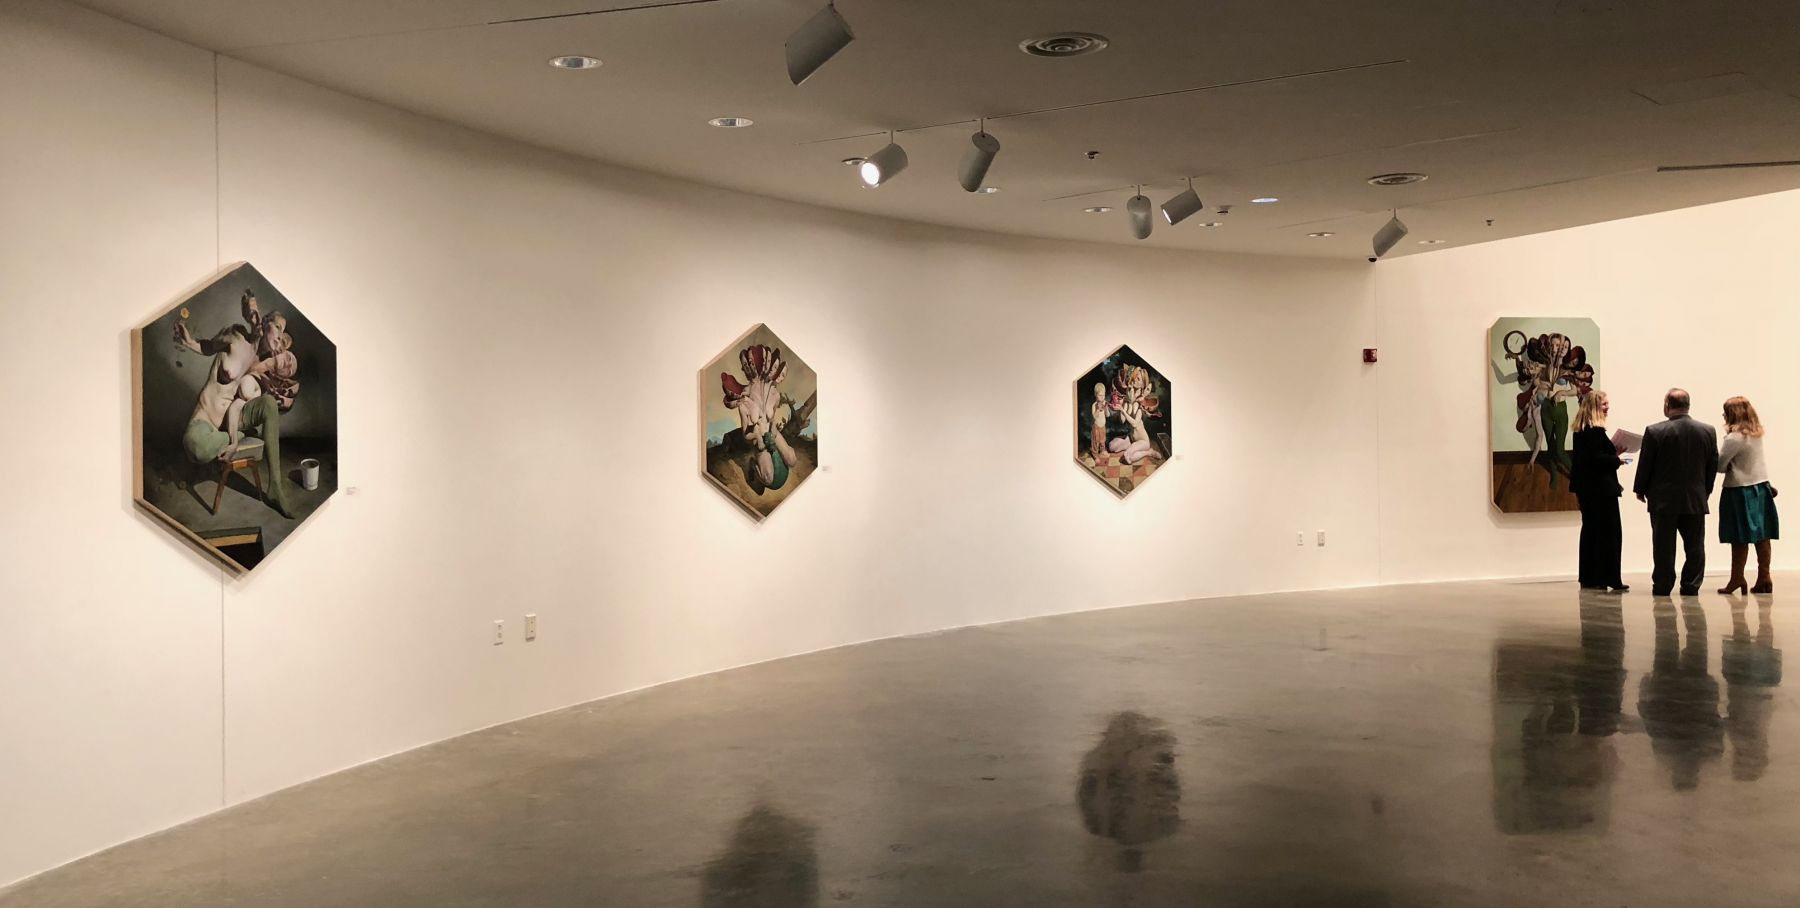 ERIK THOR SANDBERG  2018, Installation view: American University Museum Katzen Arts Center